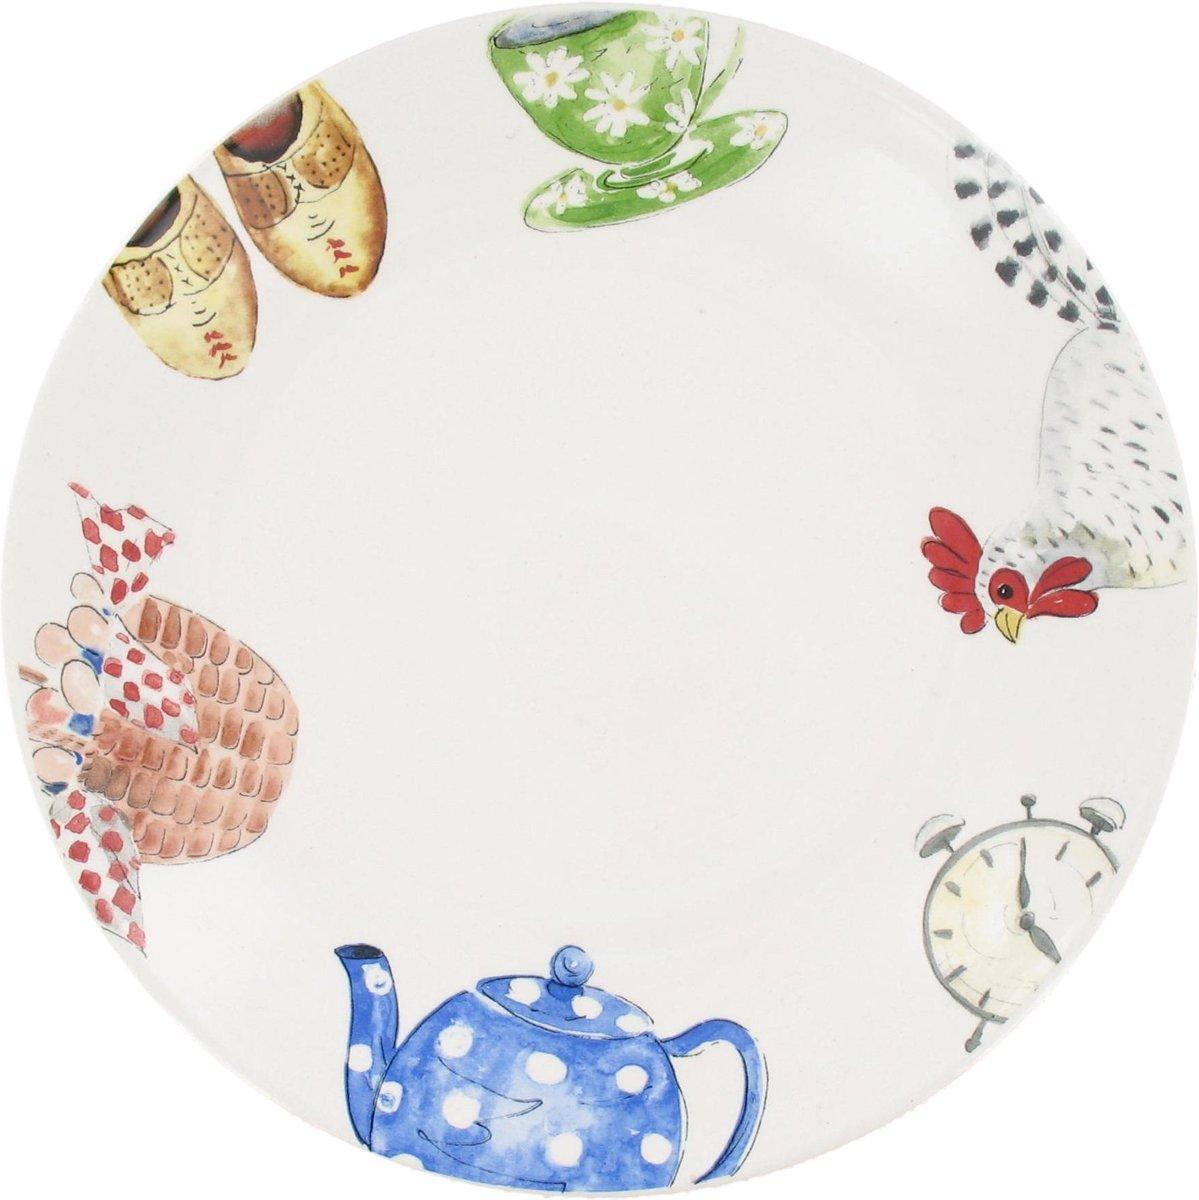 Alie Kruse-Kolk Landleven Dessertbord - Ø 22 cm - Wit kopen